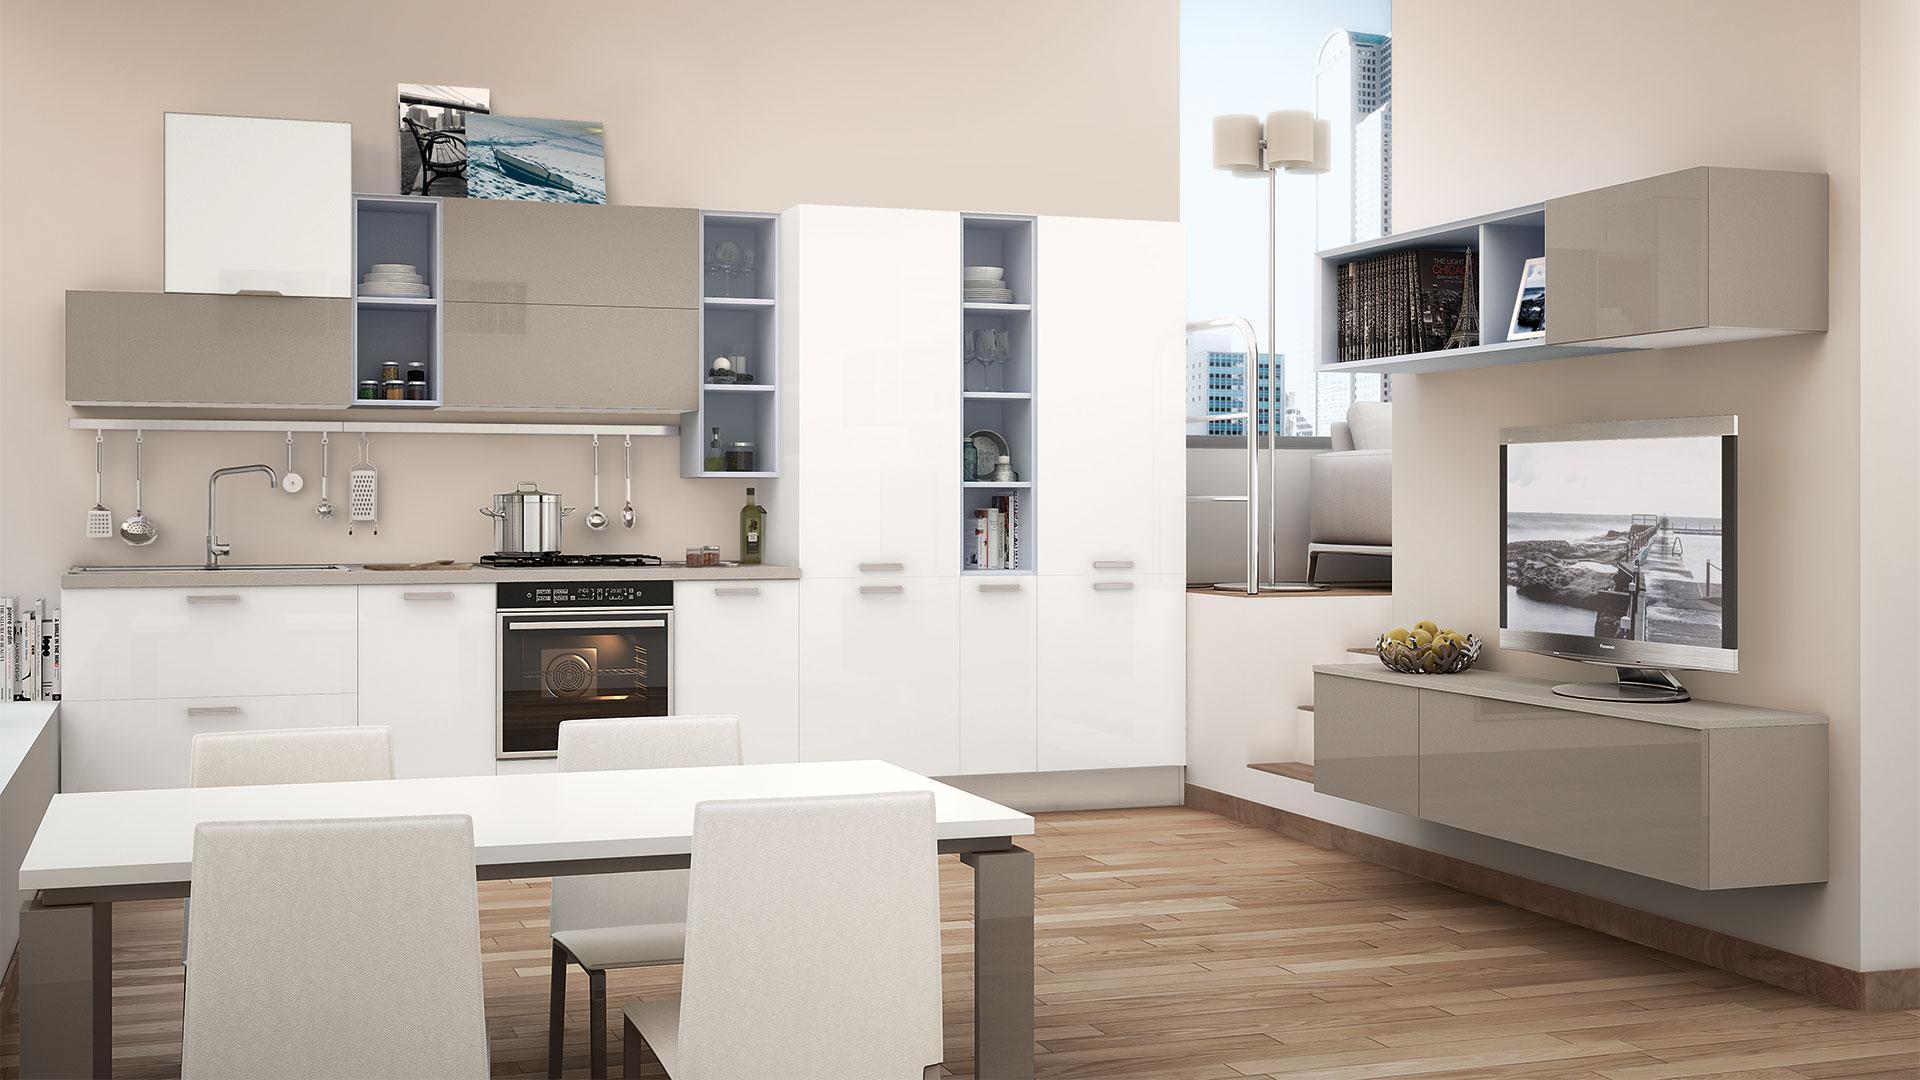 Cucine | Arredamenti Milano Folino - Part 3